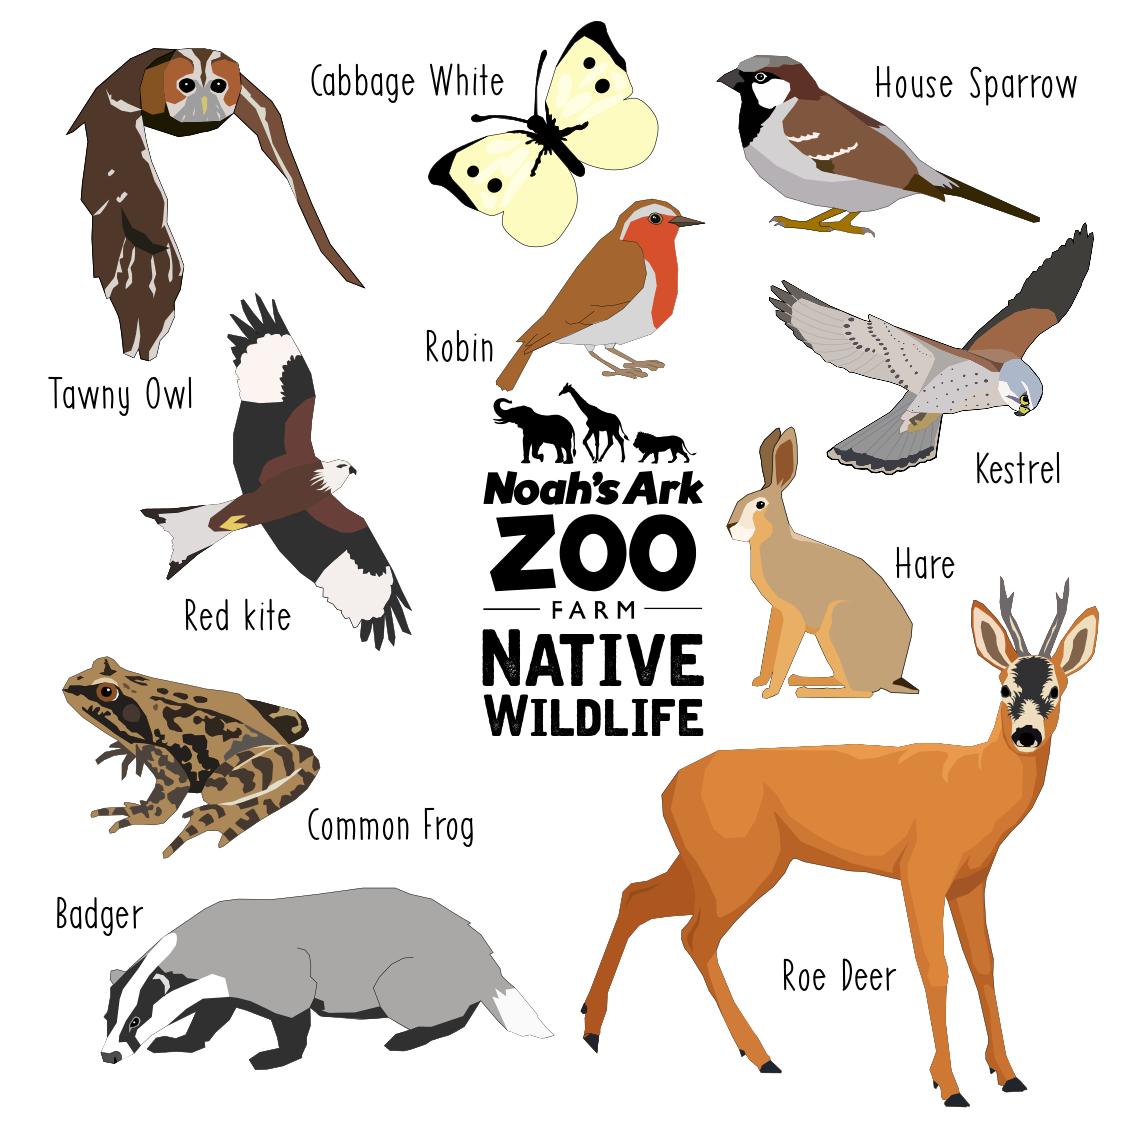 Native Wildlife images